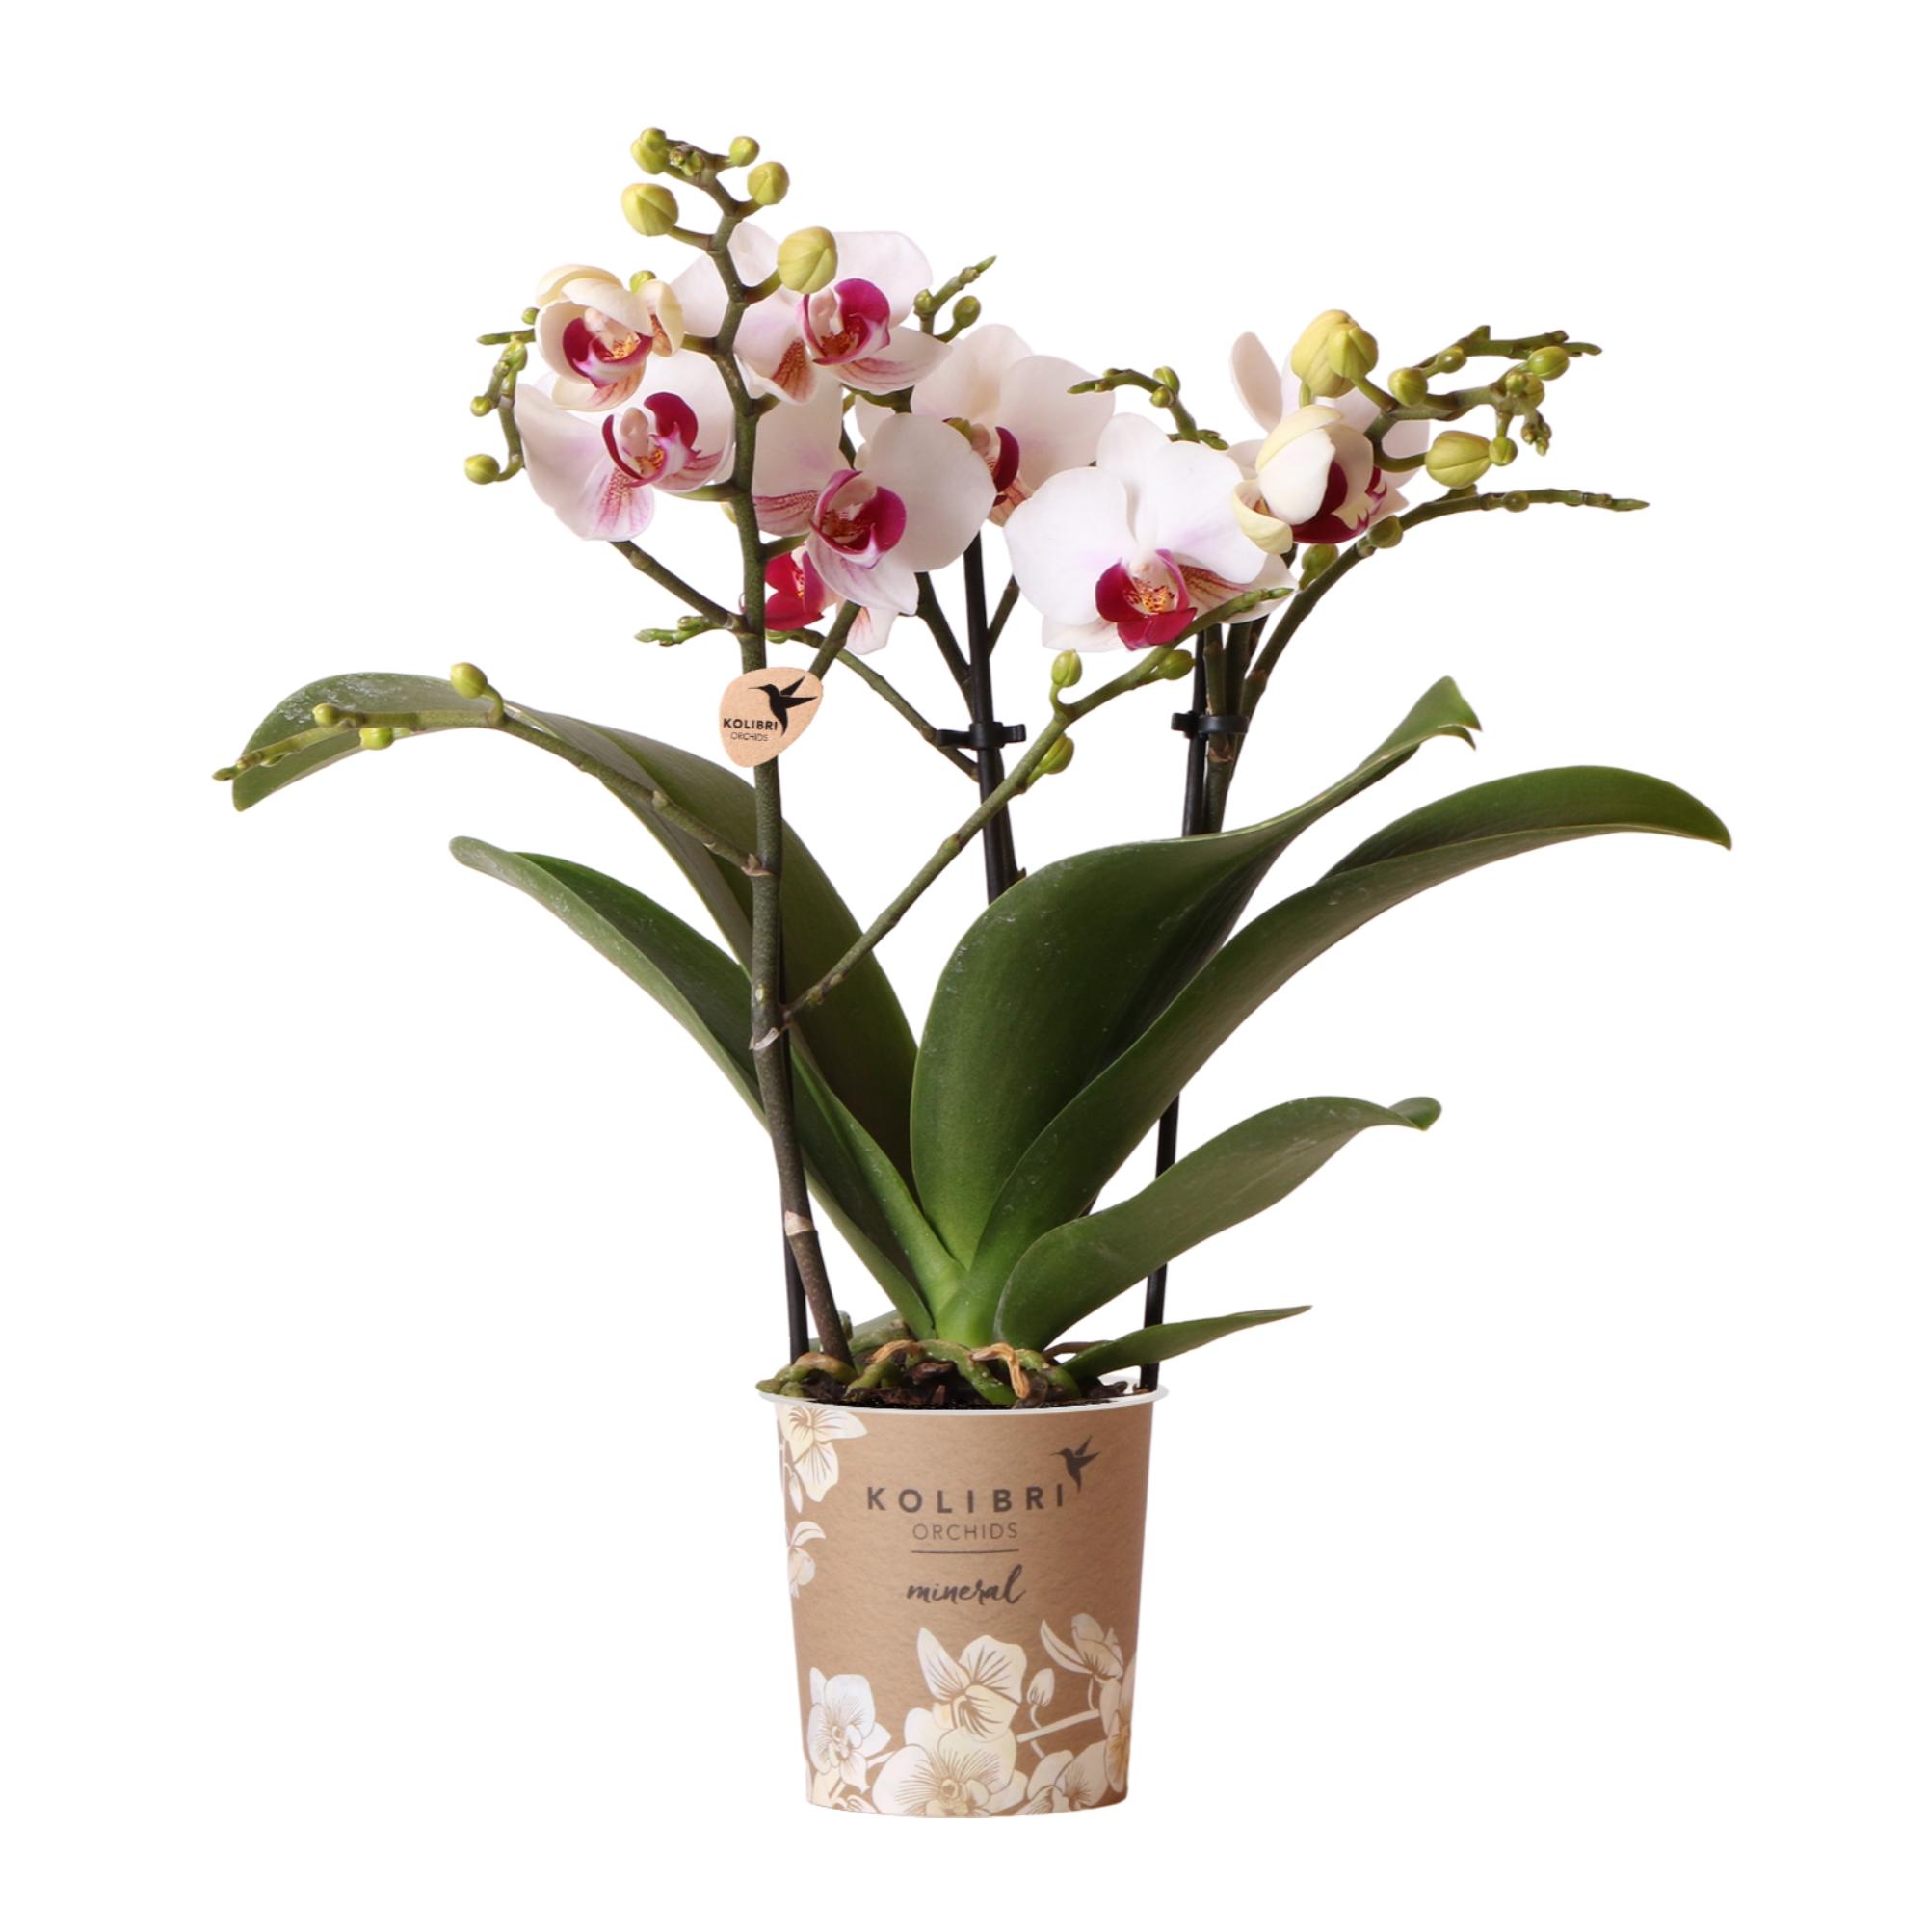 Kolibri Company - Kolibri Orchids Mineral white Gibraltar 9cm orchidee kopen